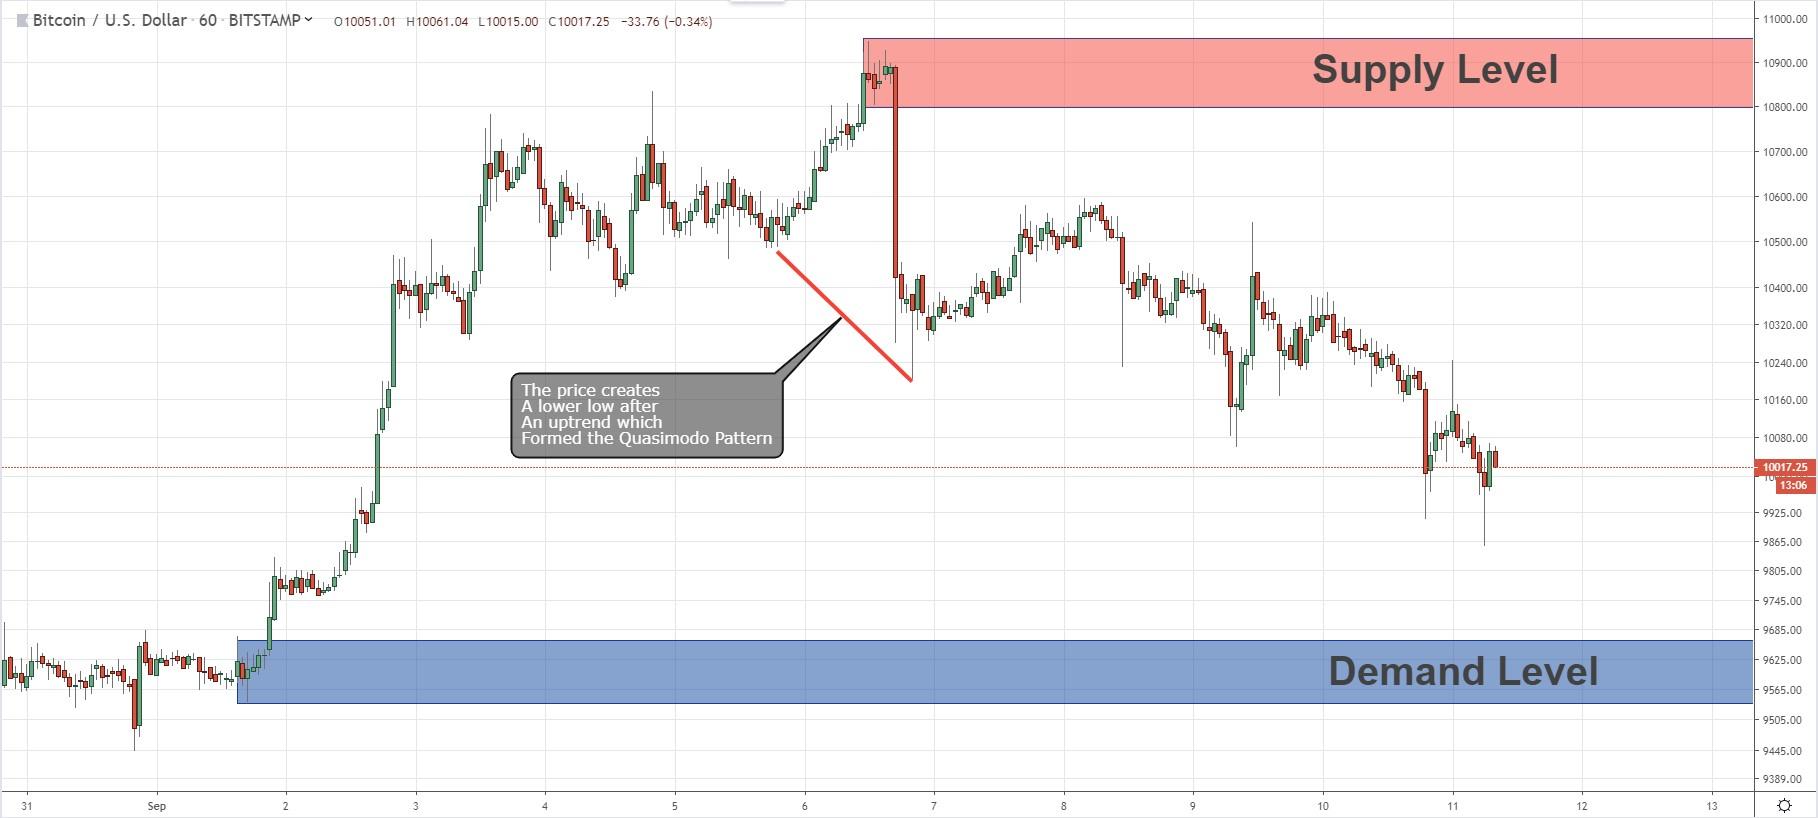 Price Action Analysis For BTC/USD.